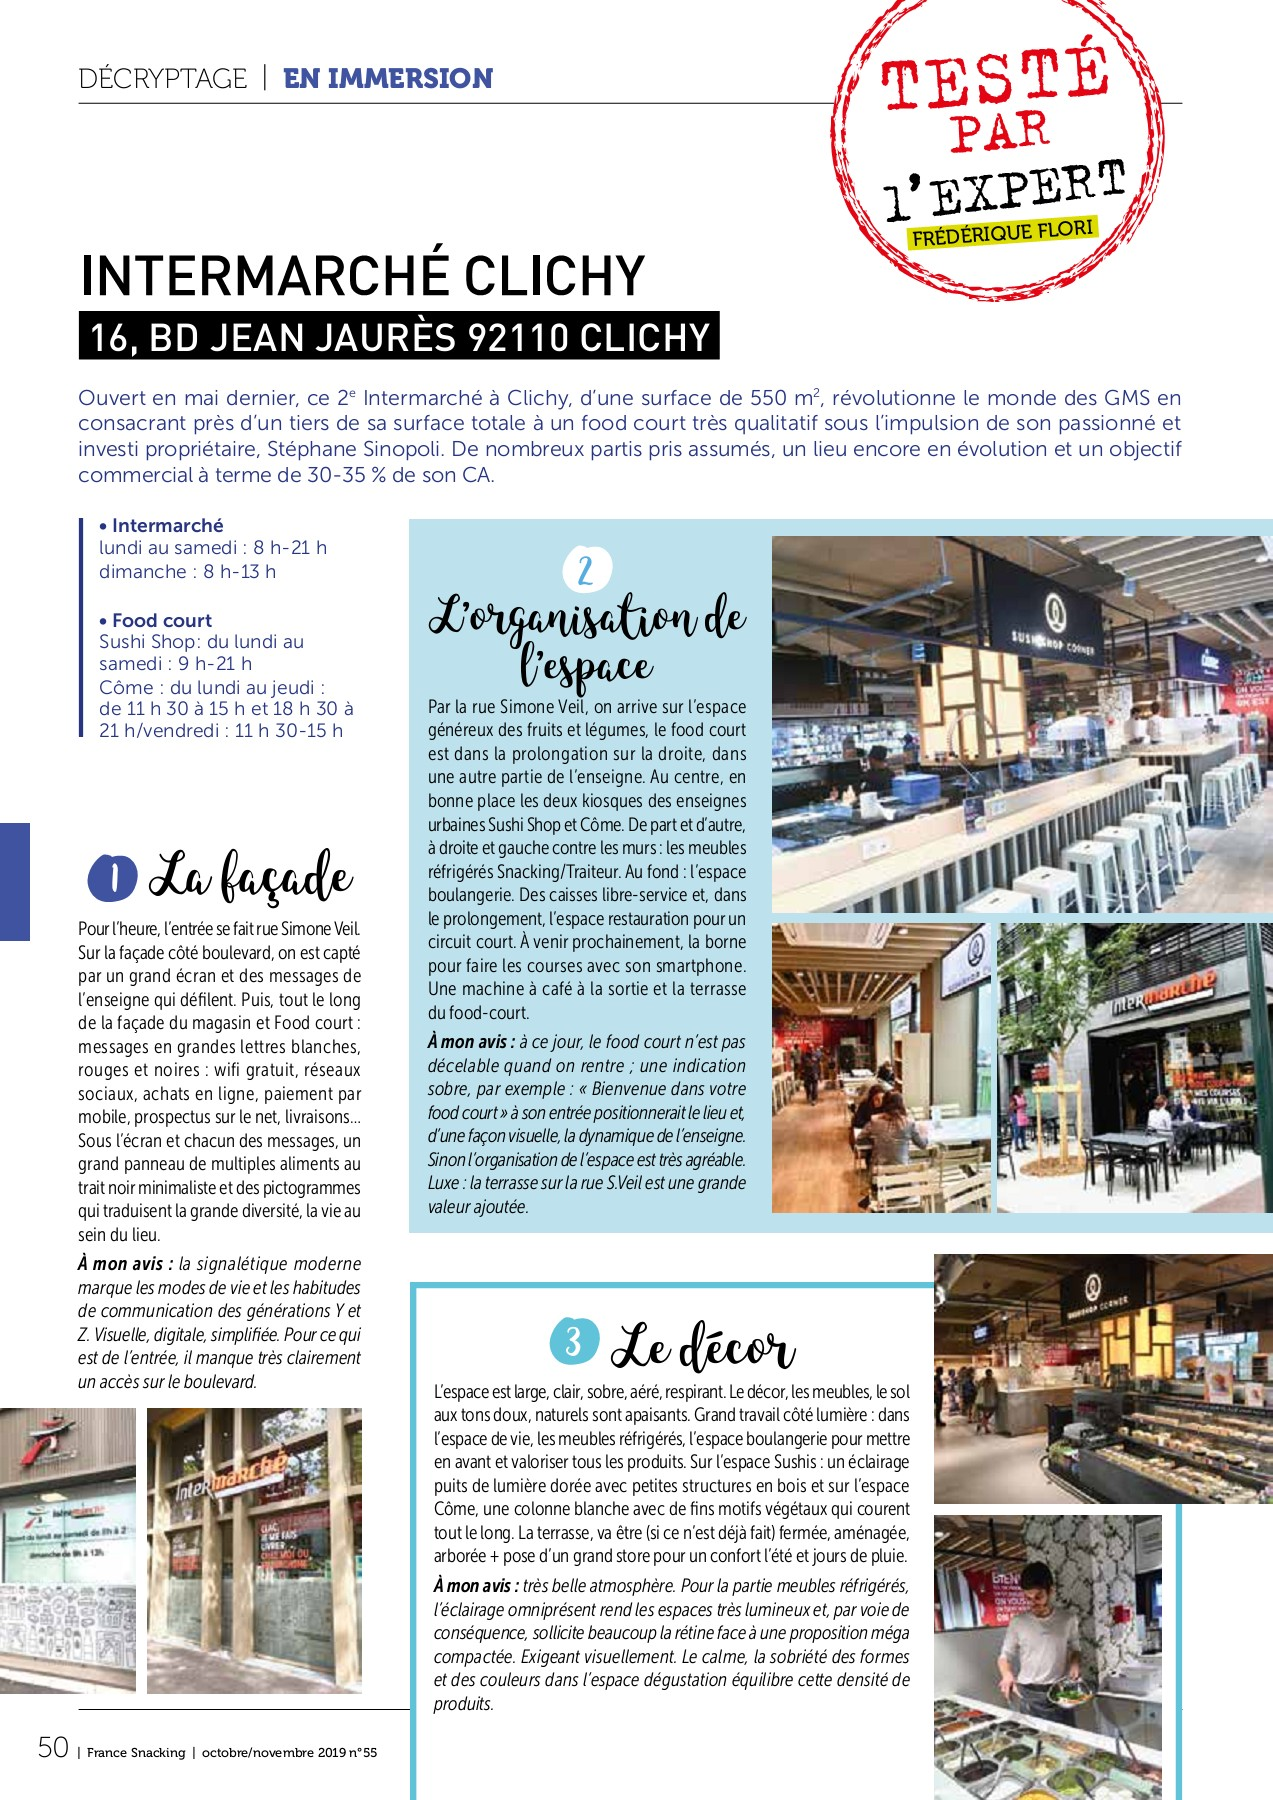 Salon Jardin Intermarche Frais France Snacking N°55 Pages 51 100 Text Version Of 20 Best Of Salon Jardin Intermarche